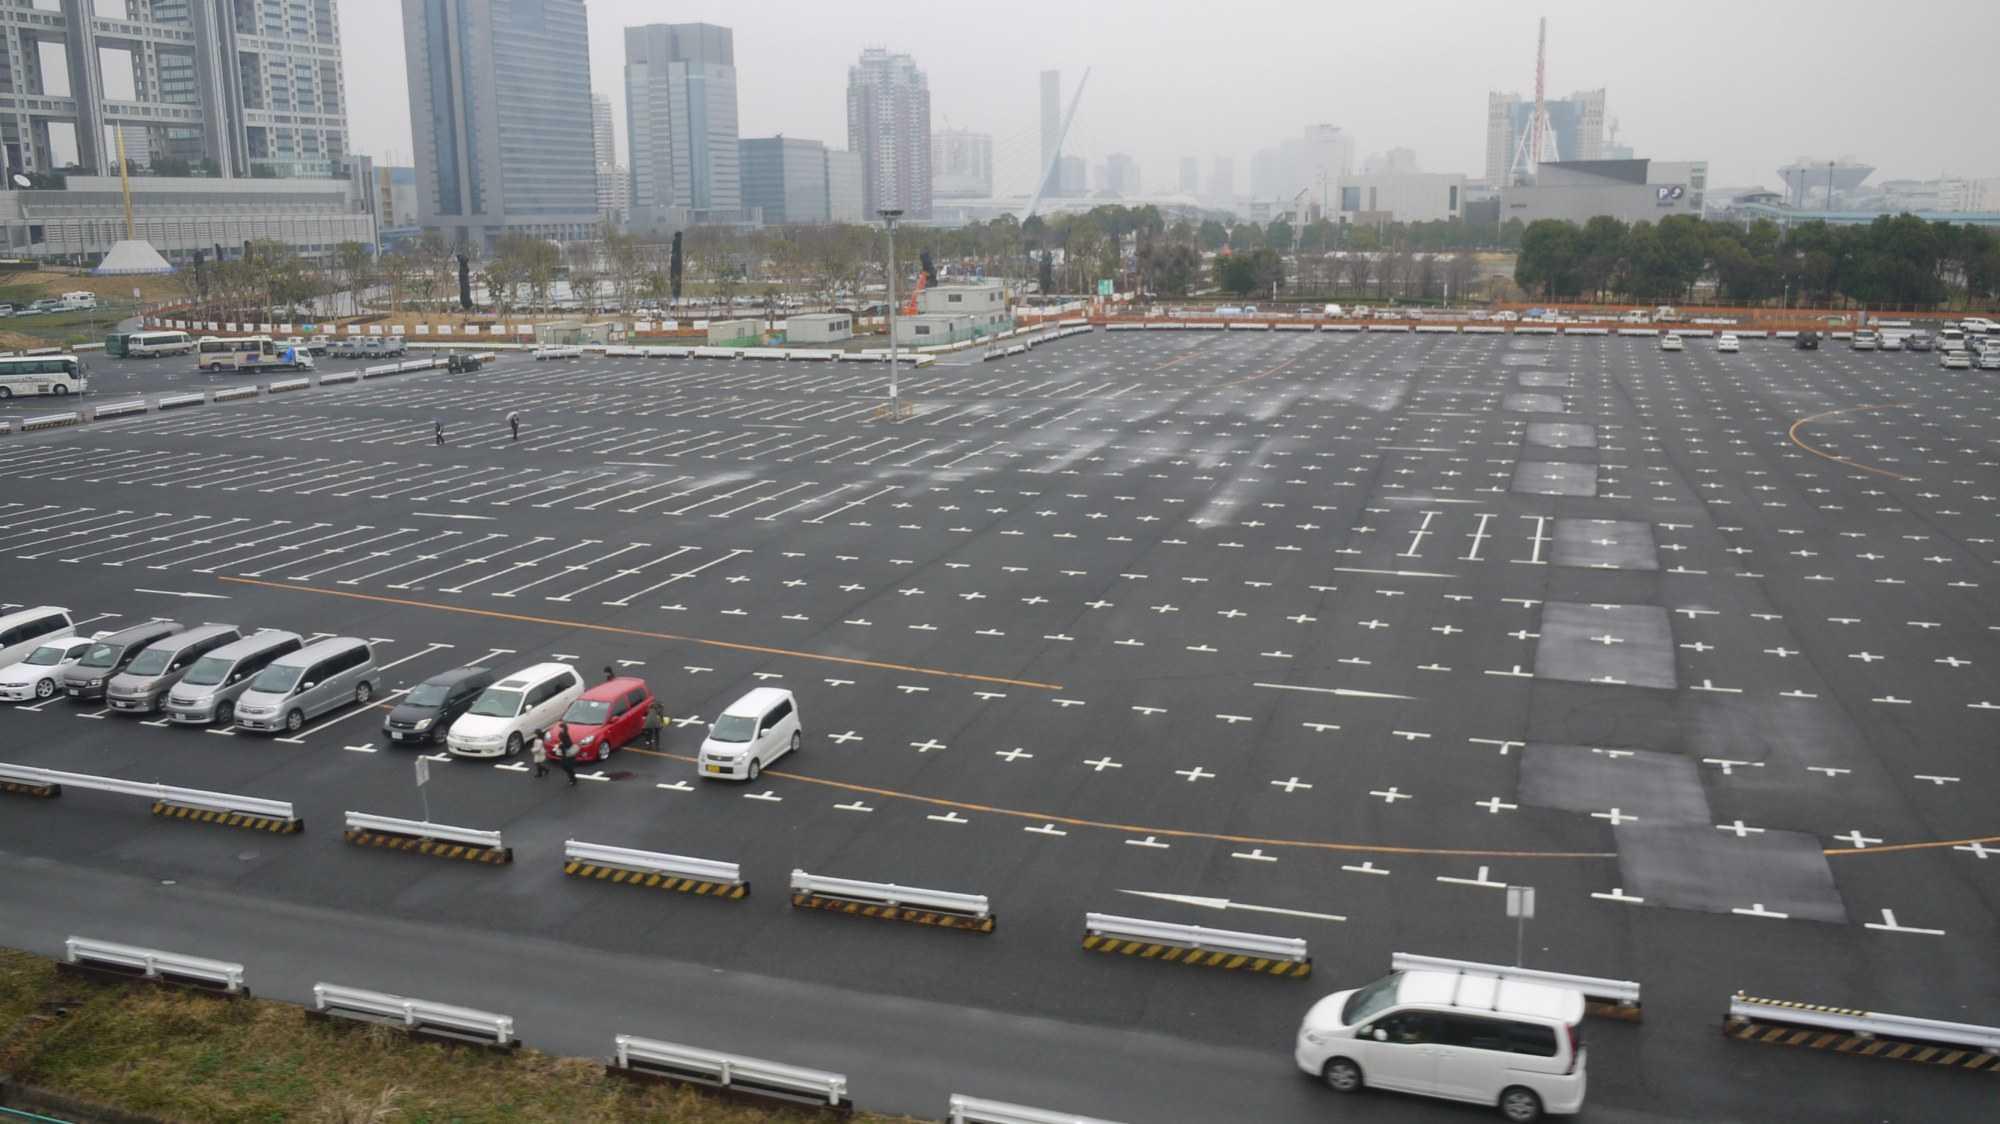 Großer Parkplatz, fast leer